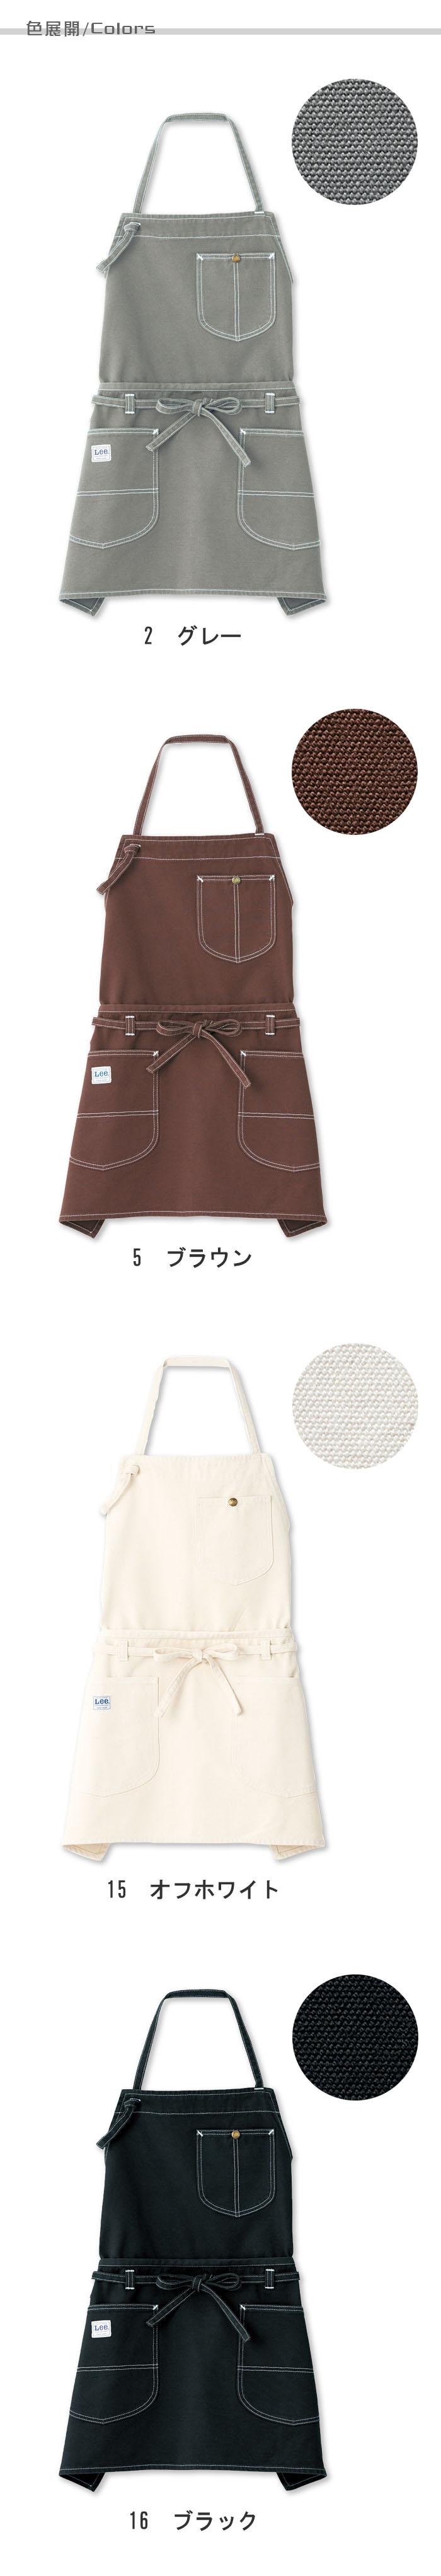 Lee workwear胸付でも腰下でも使える2WAYエプロン 4色【男女兼用】綿100% 色展開説明